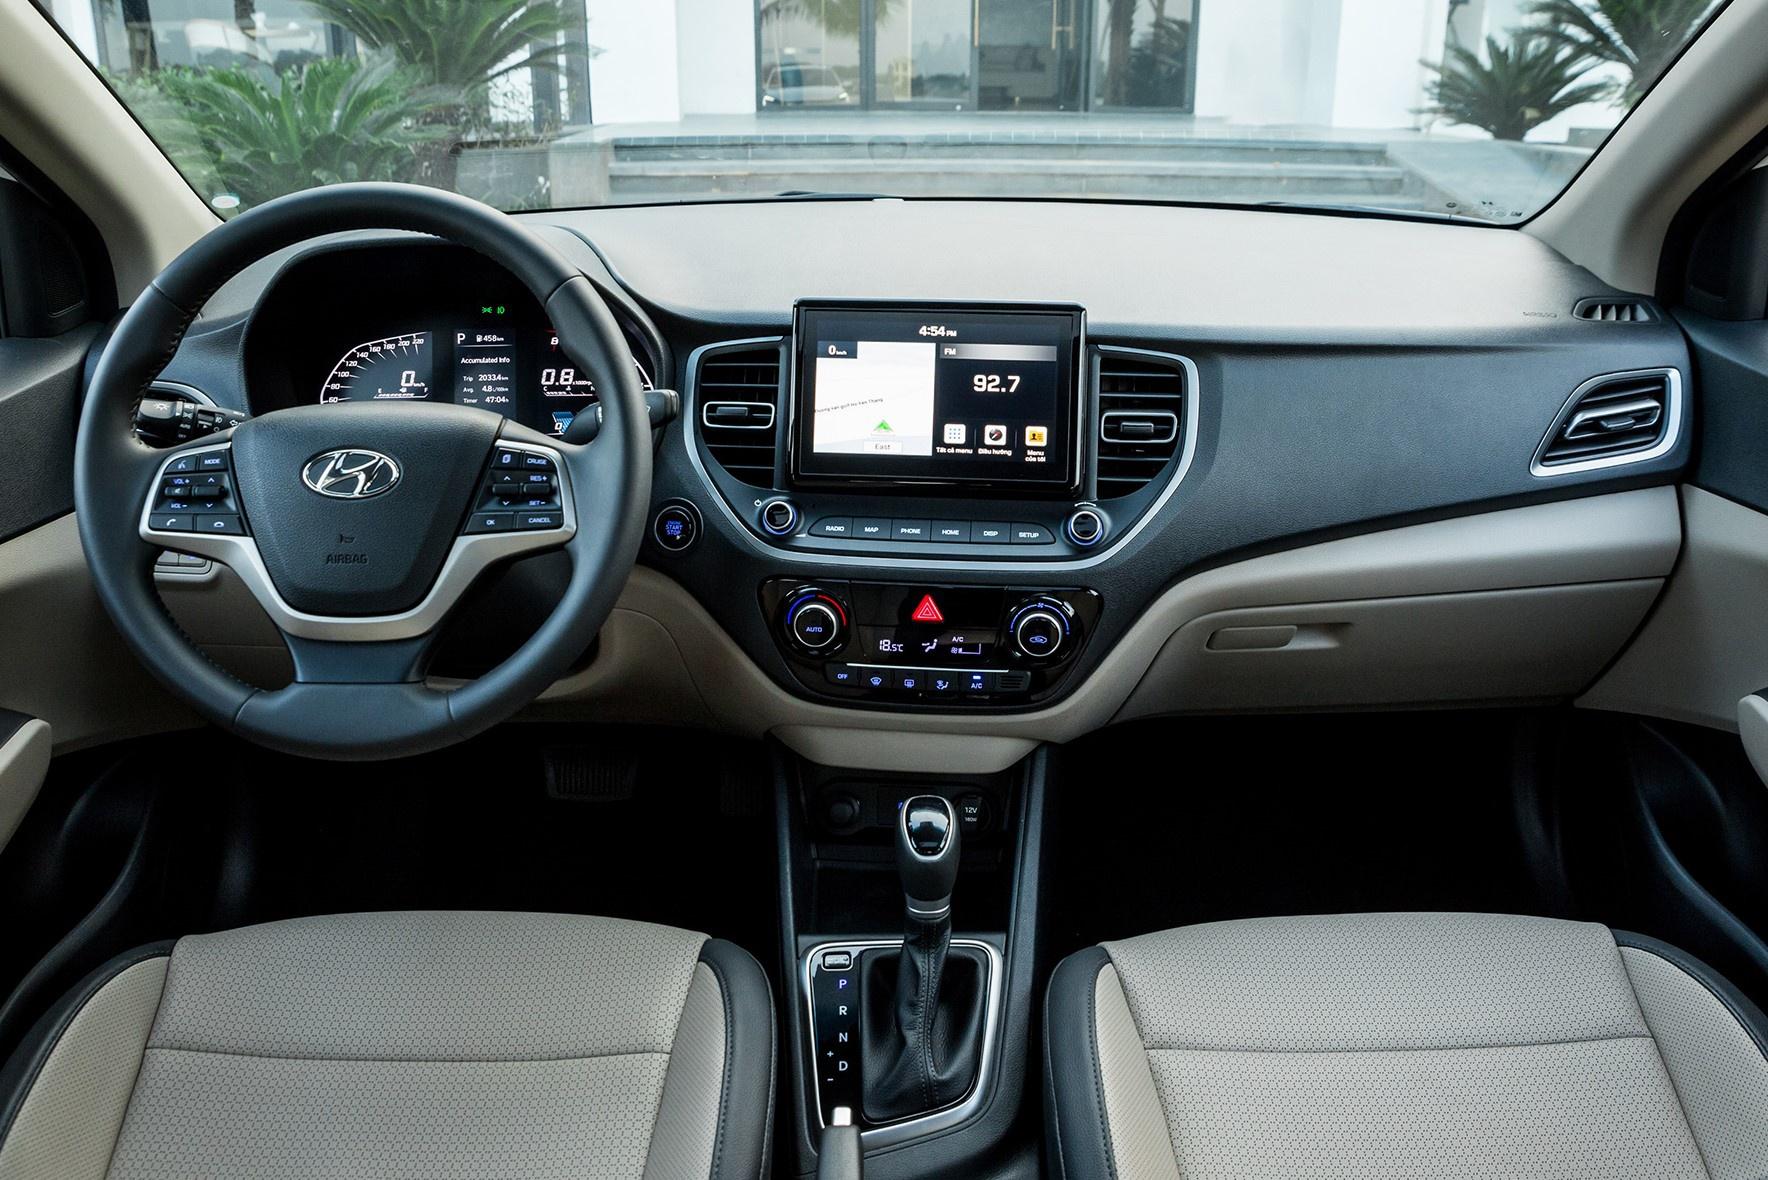 so sanh Hyundai Accent va Toyota Vios 2021 anh 9